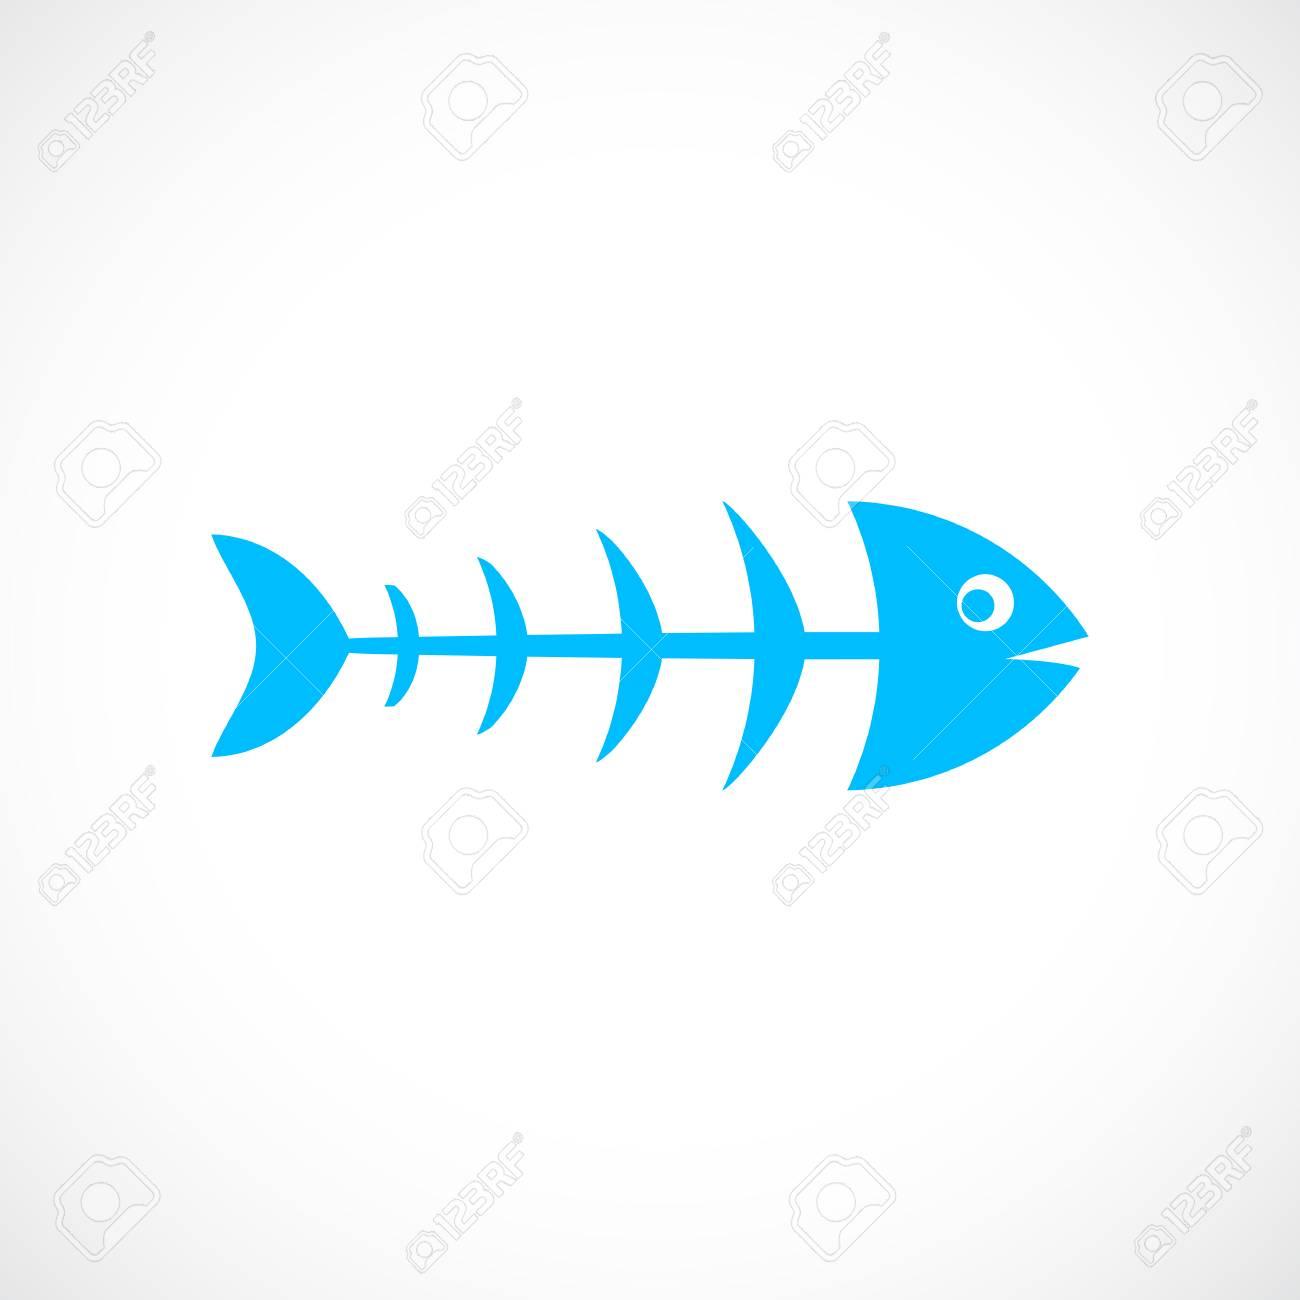 Fish skeleton vector icon - 79096948